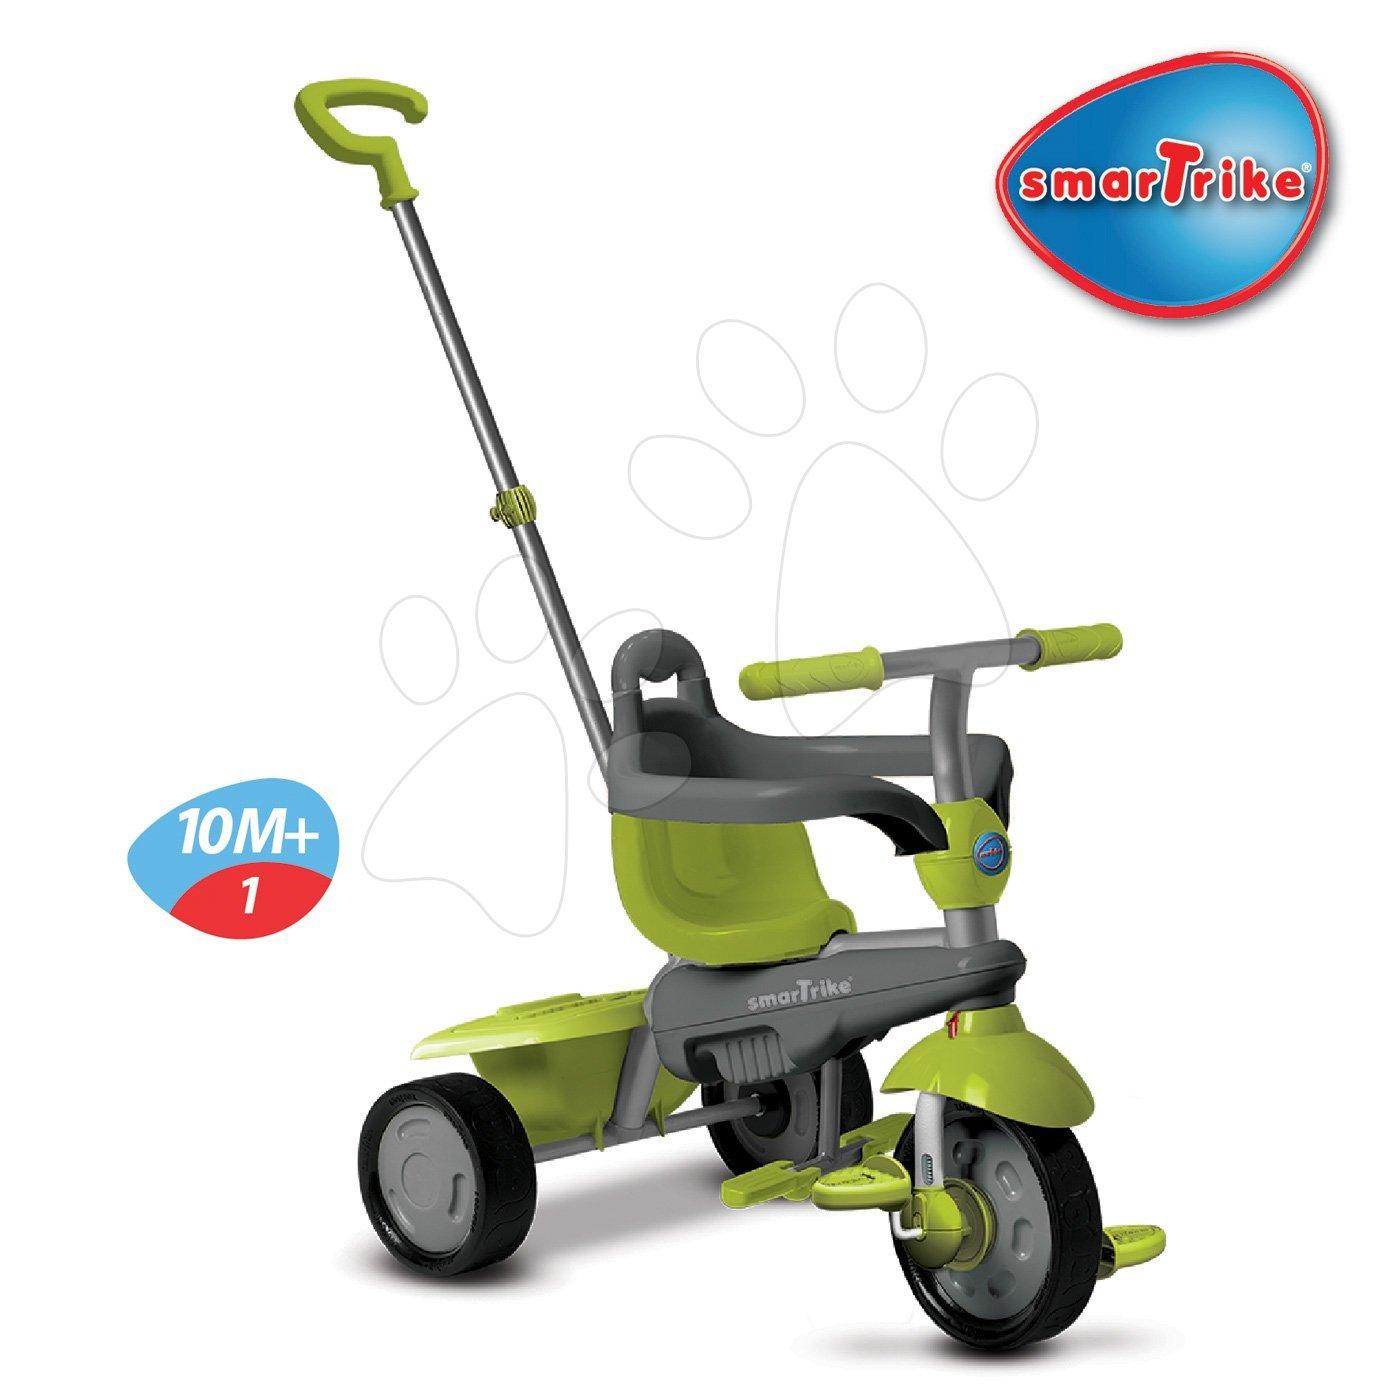 Trojkolky od 10 mesiacov - Trojkolka Breeze Touch Steering smarTrike zeleno-šedá od 10 mes